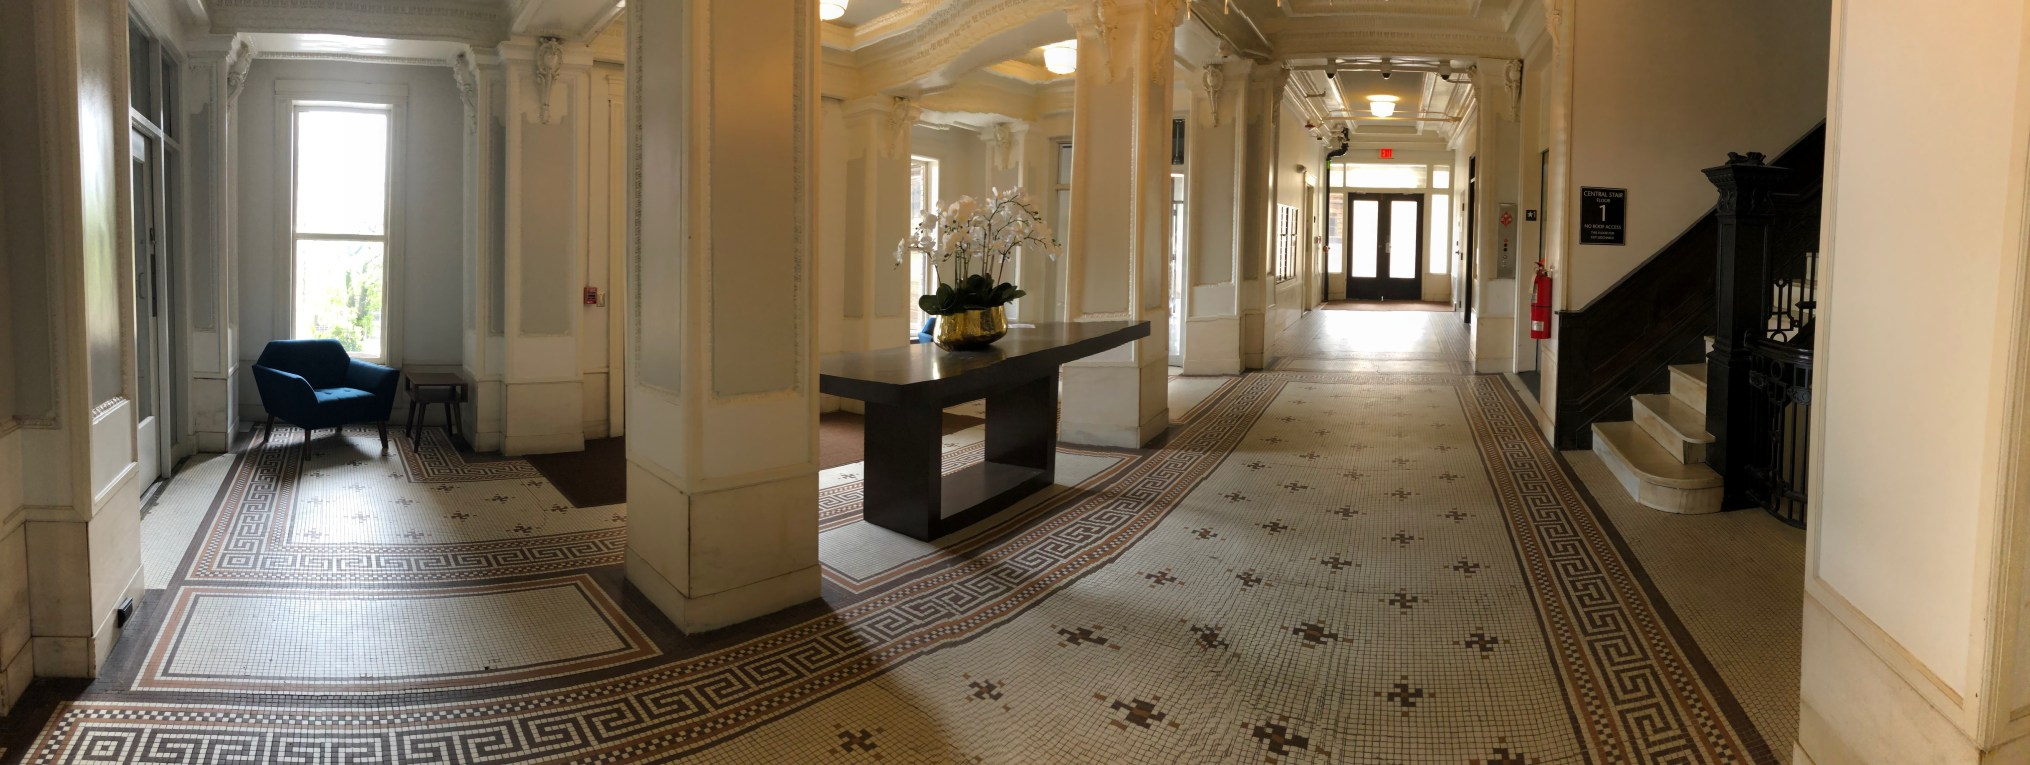 Apartment Building - Lobby